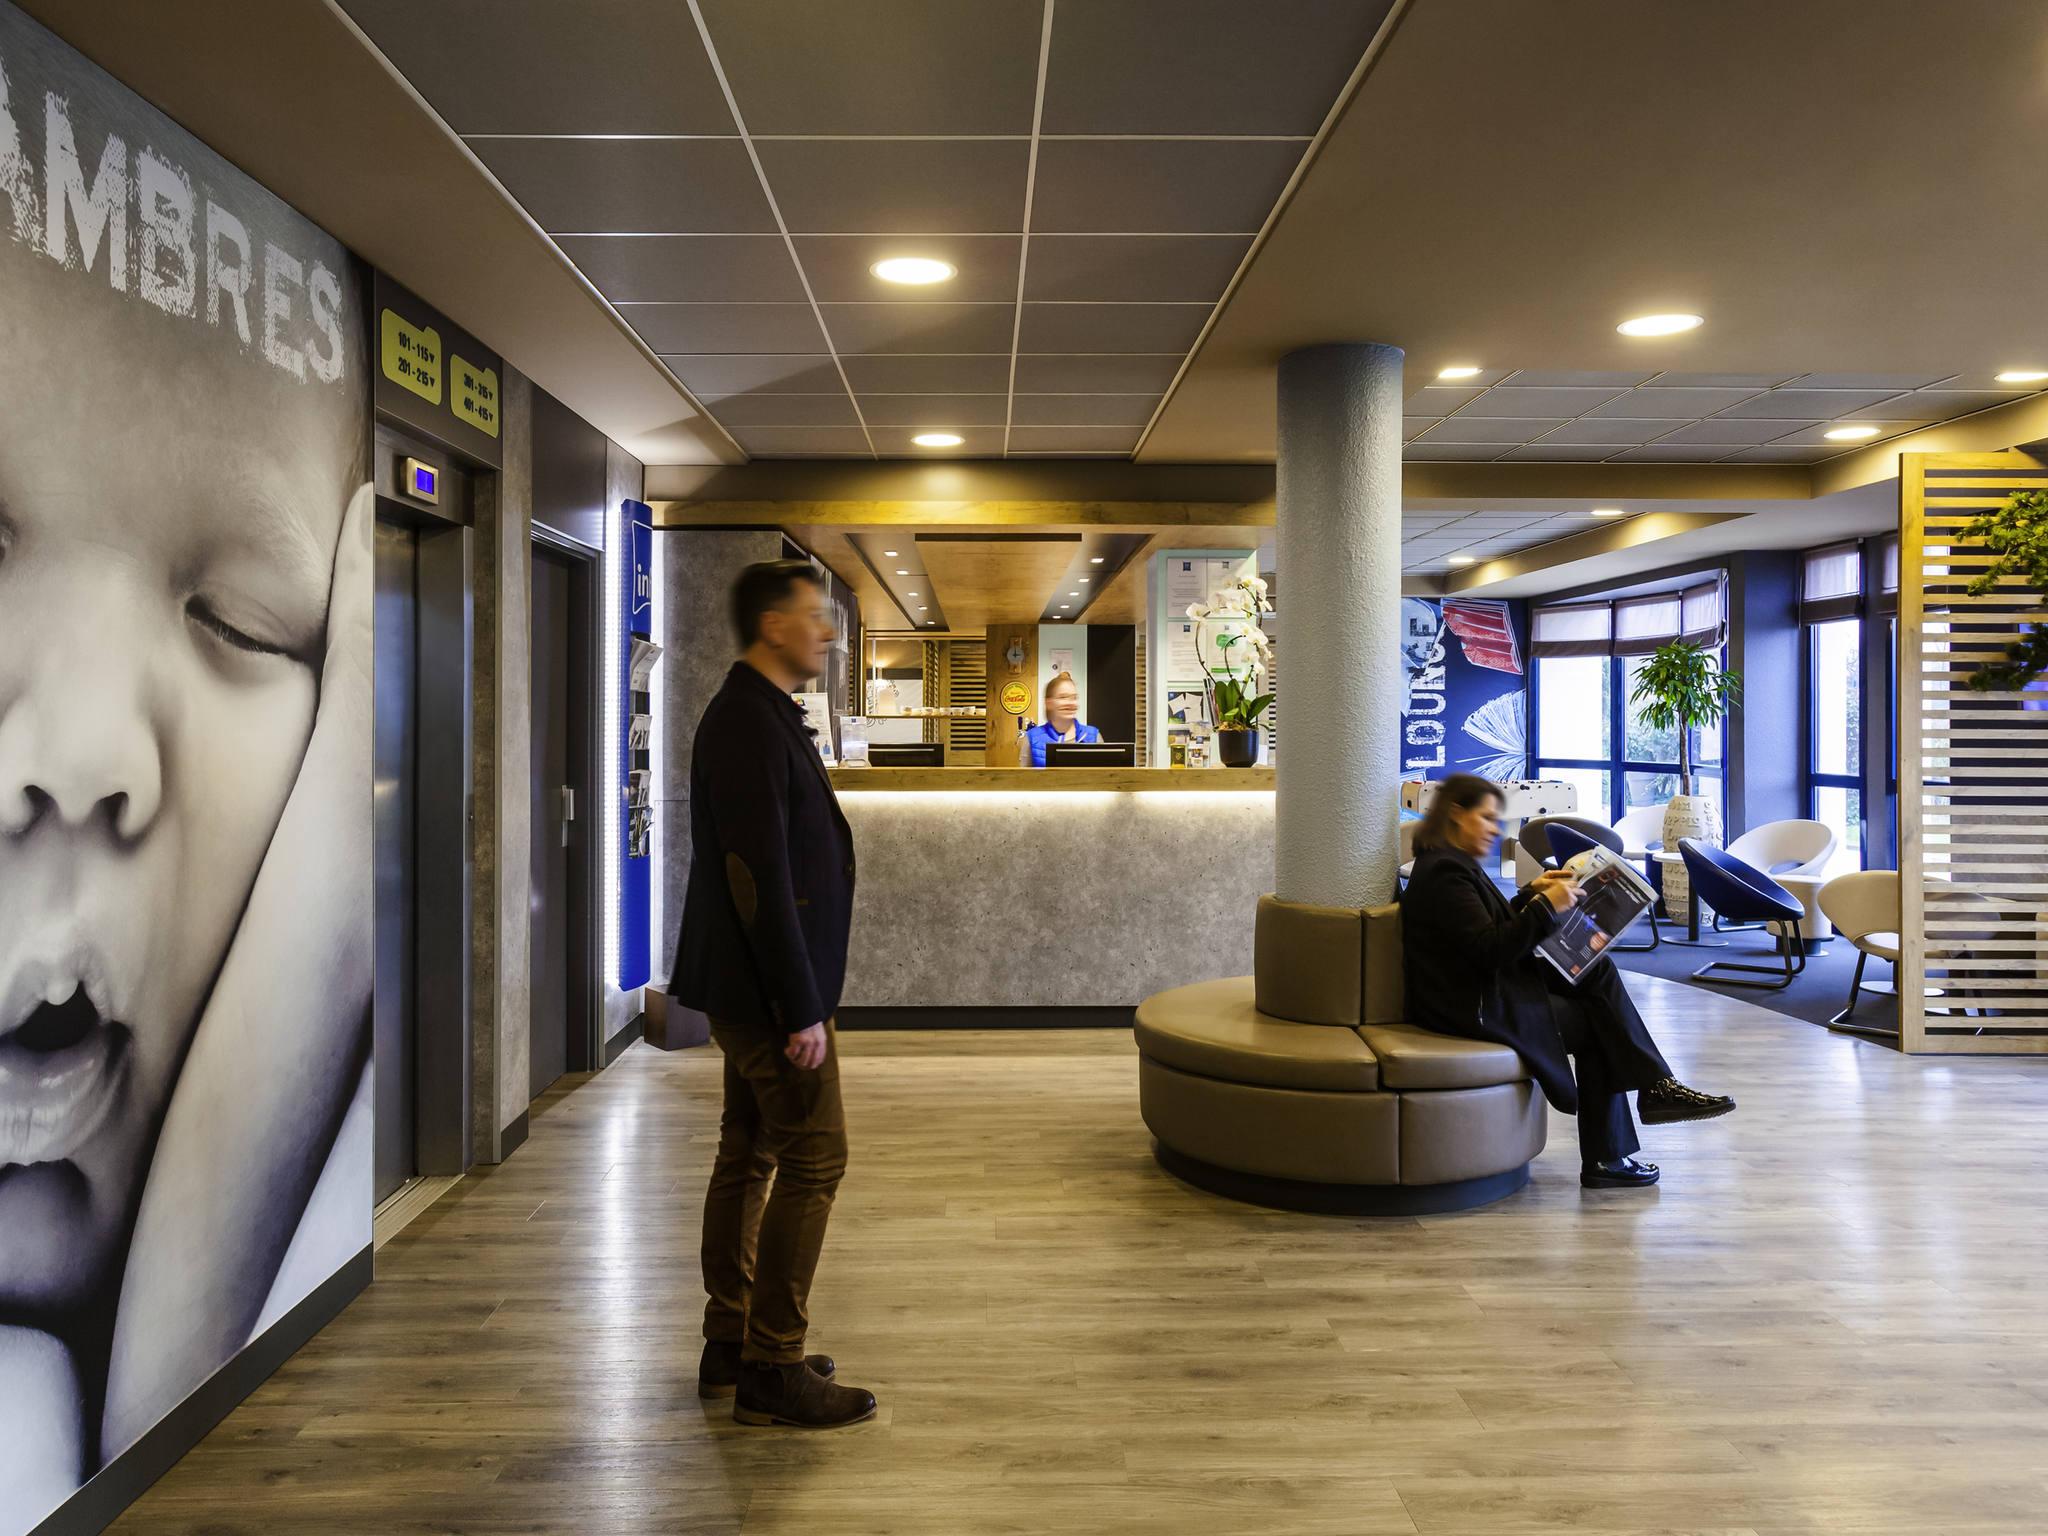 فندق - ibis budget Marne-la-Vallée Pontault-Combault